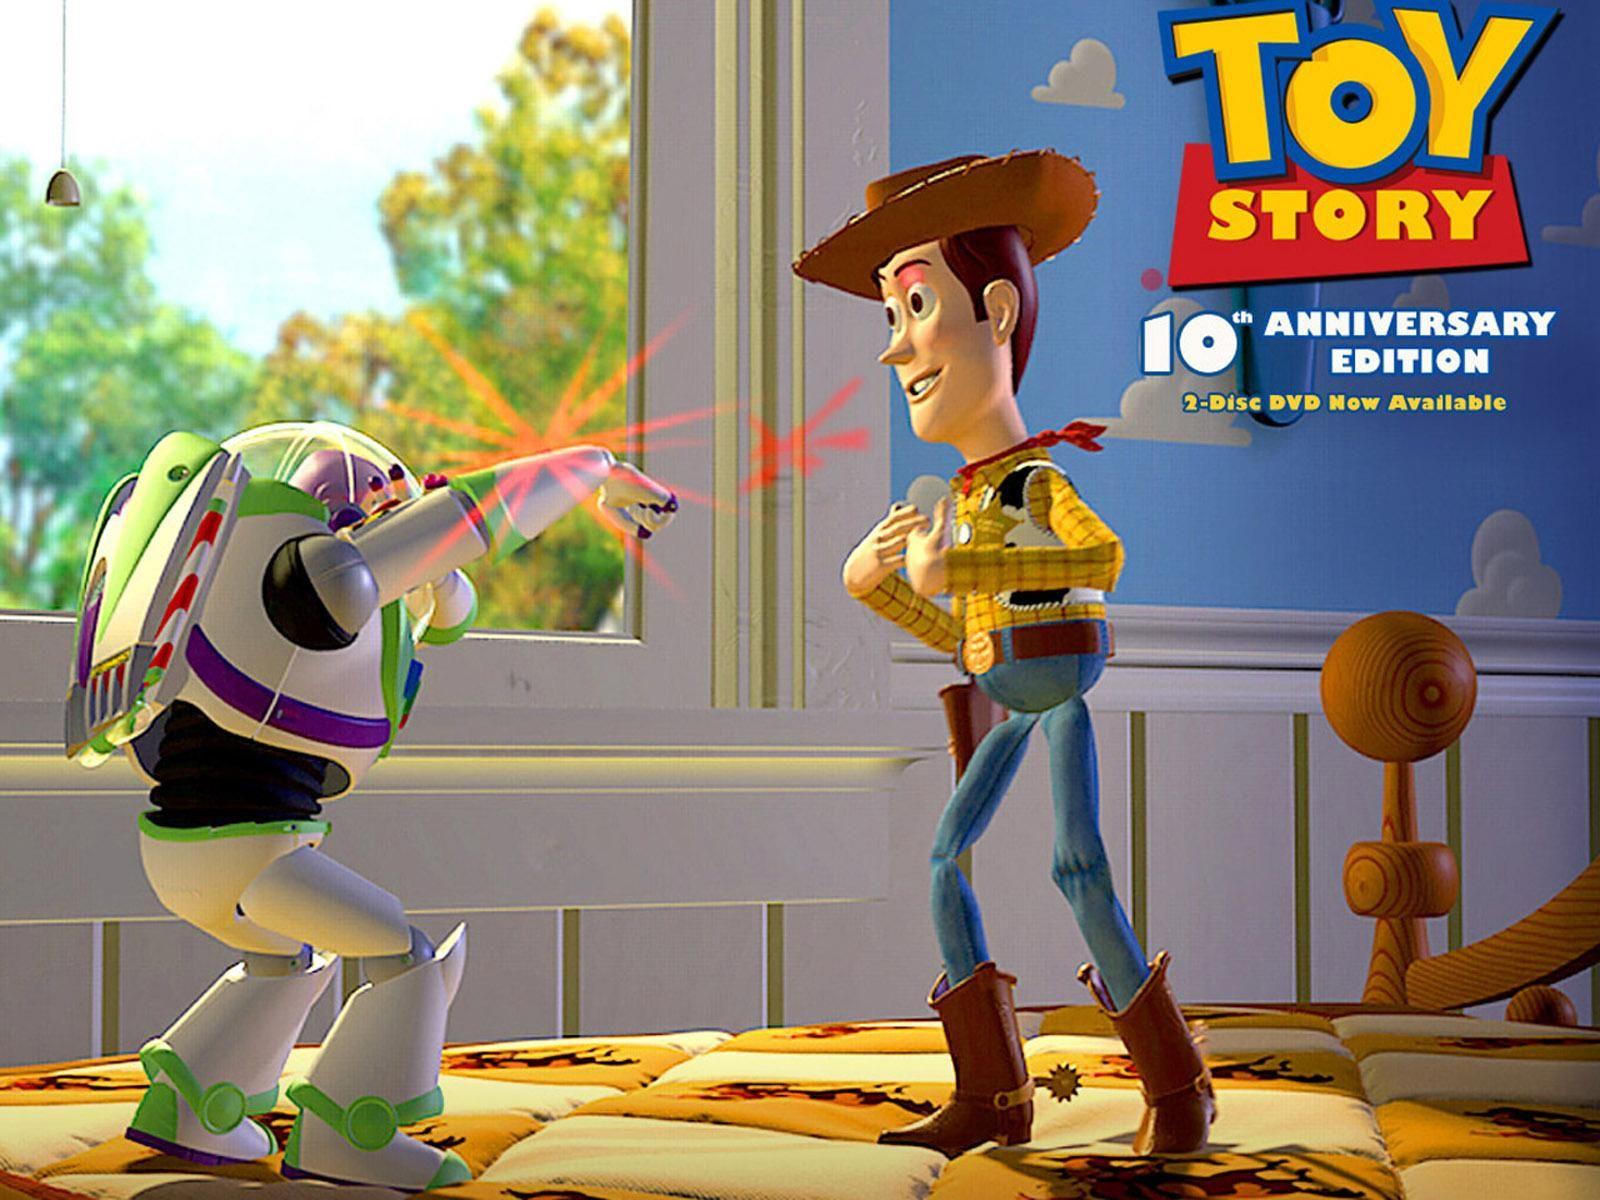 Toy Story Wallpapers,Toy Story Wallpapers & Pictures Free